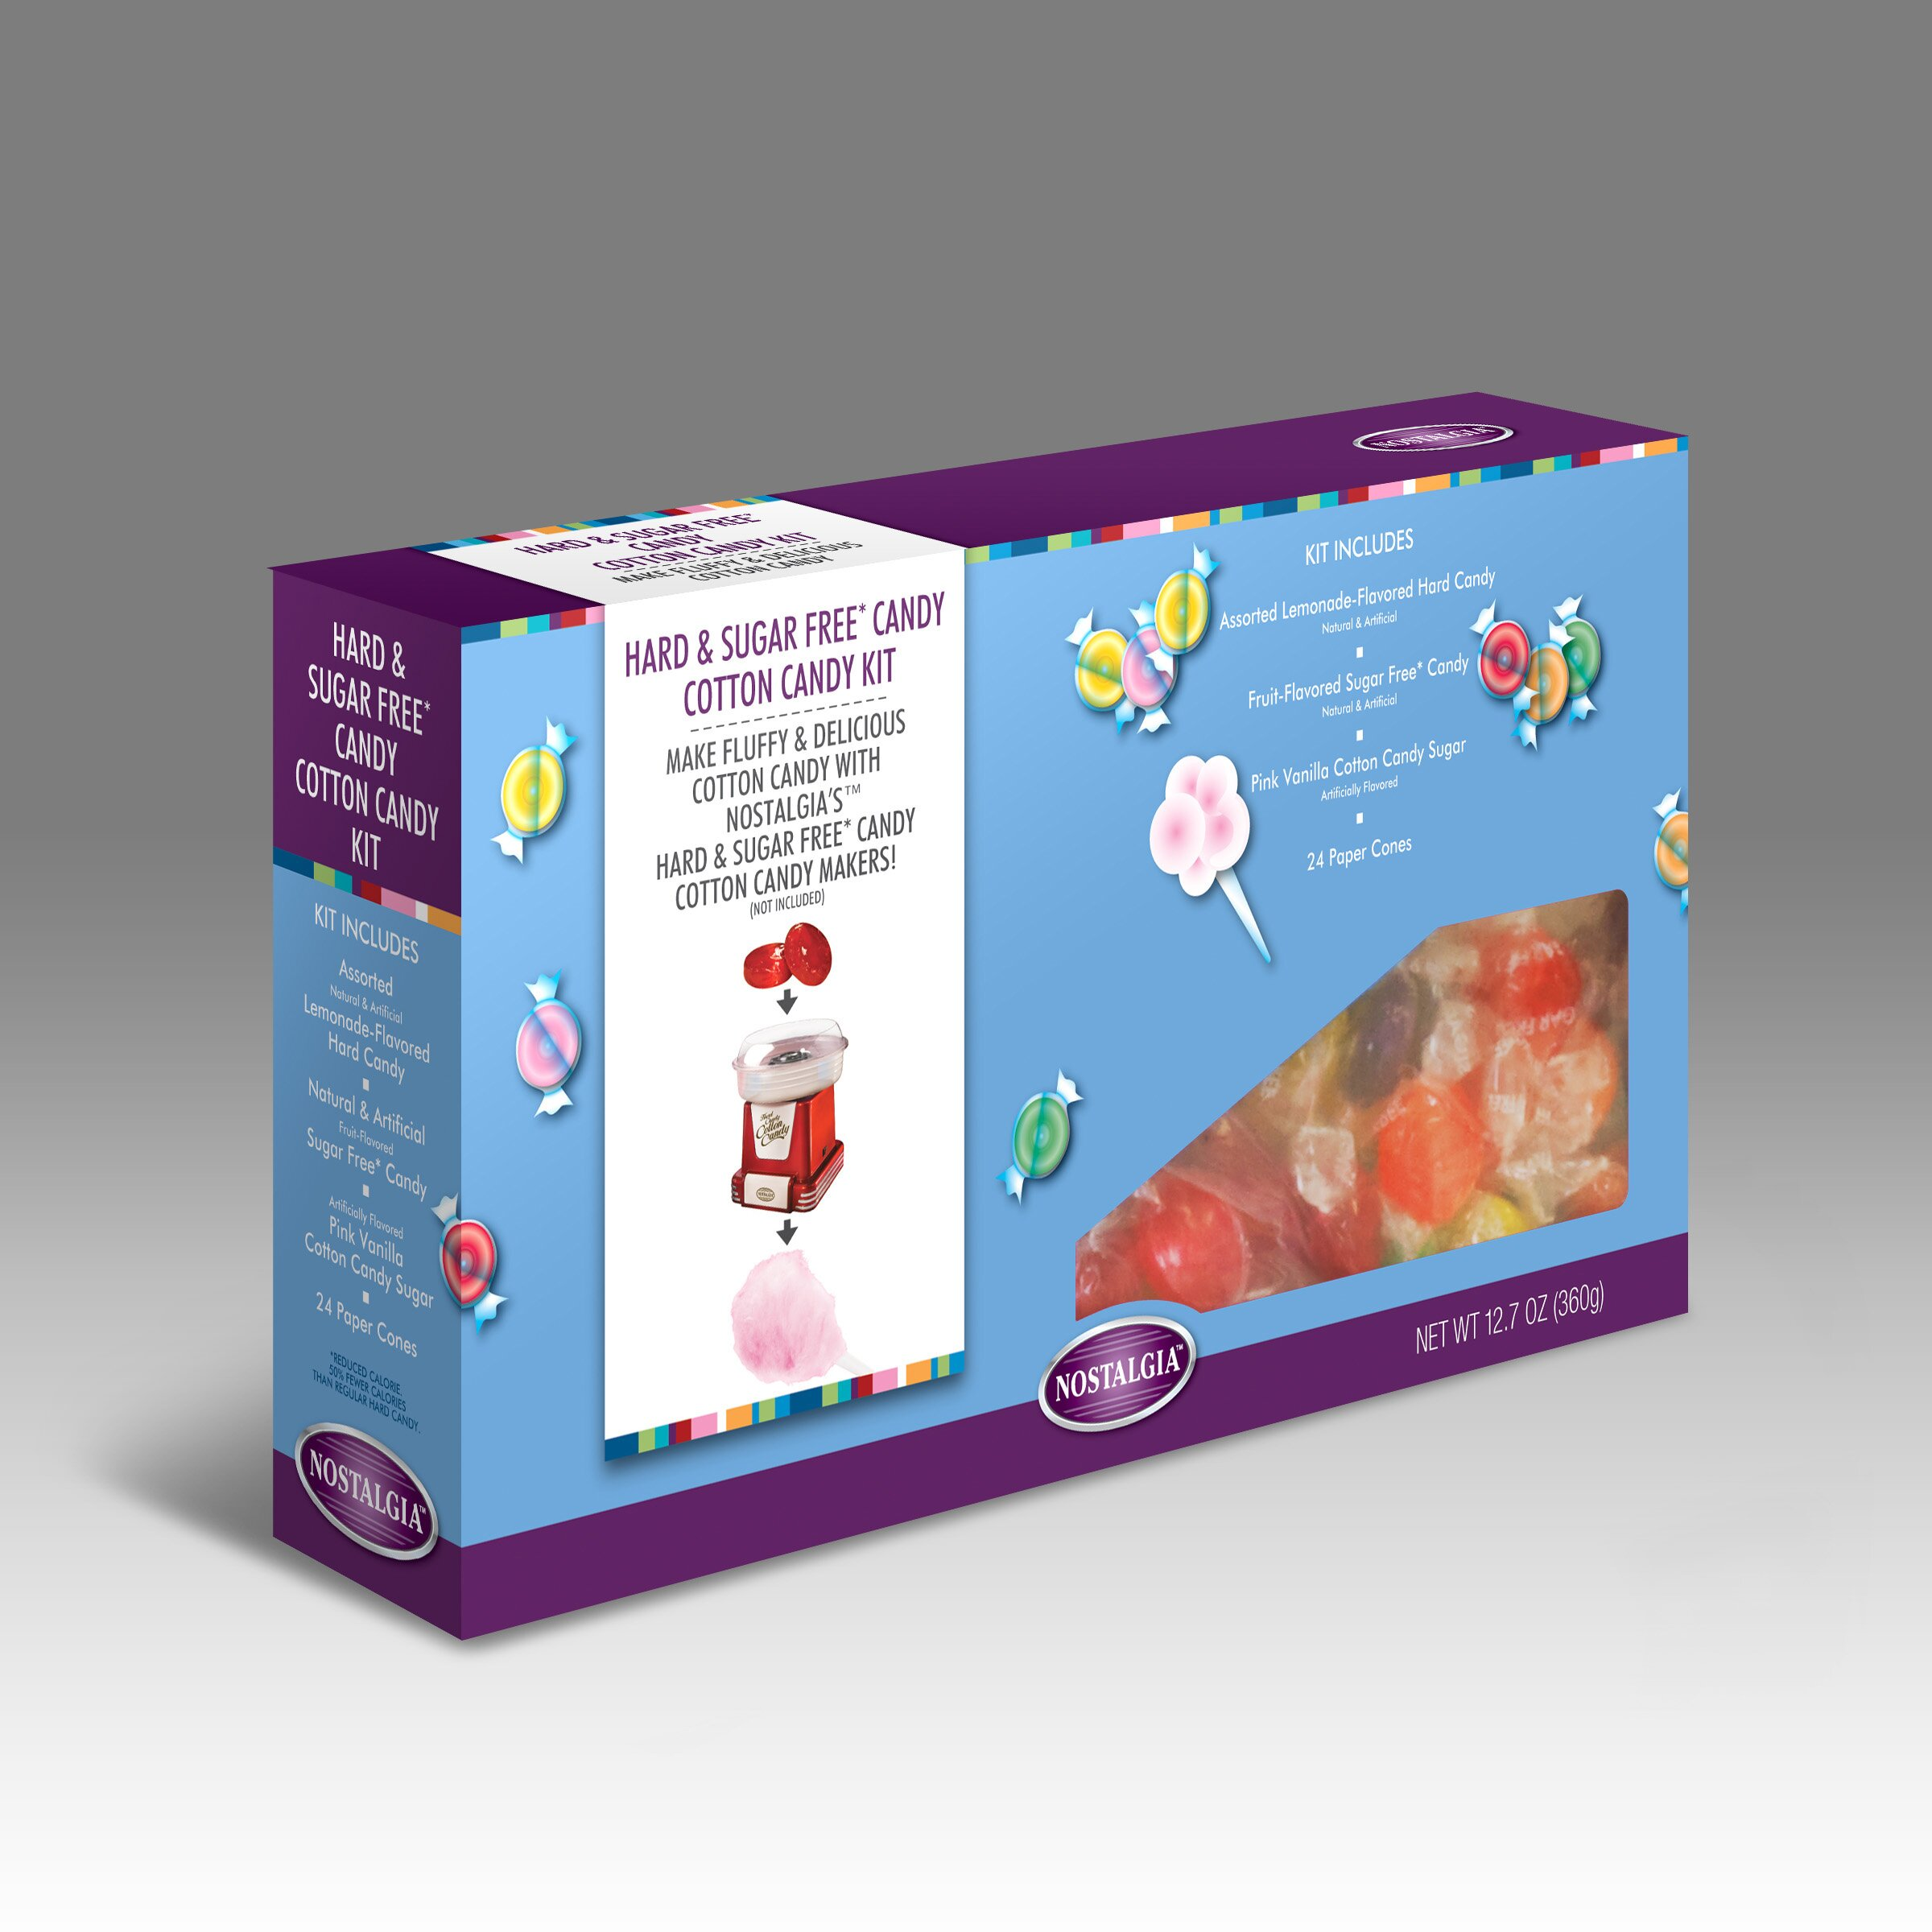 cotton candy nostalgia electrics instructions